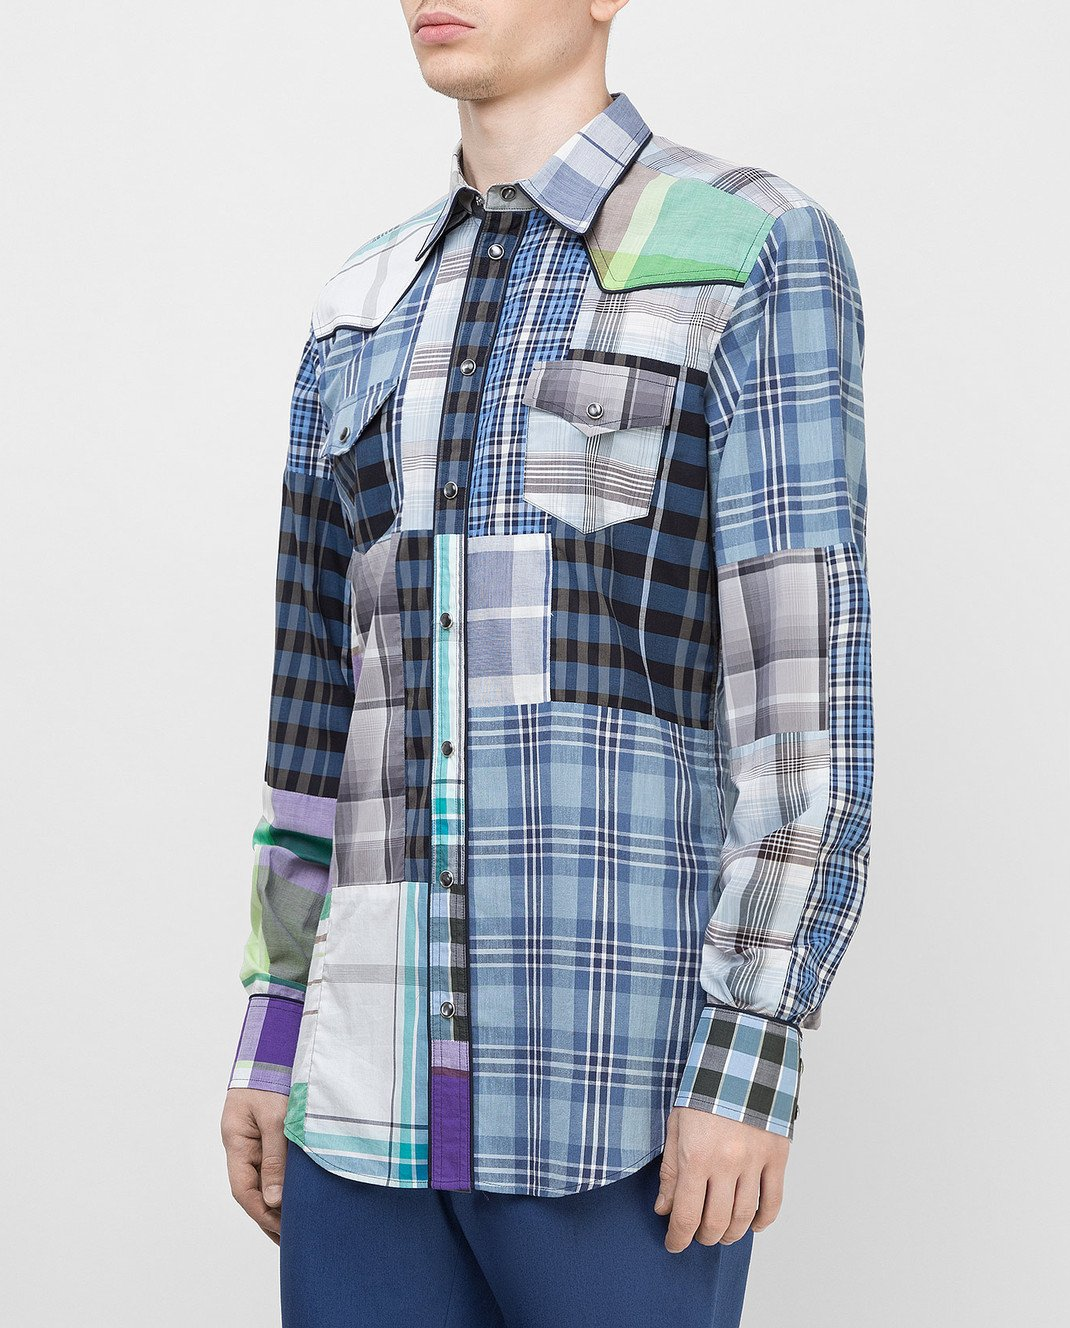 Dolce&Gabbana Синяя рубашка изображение 3